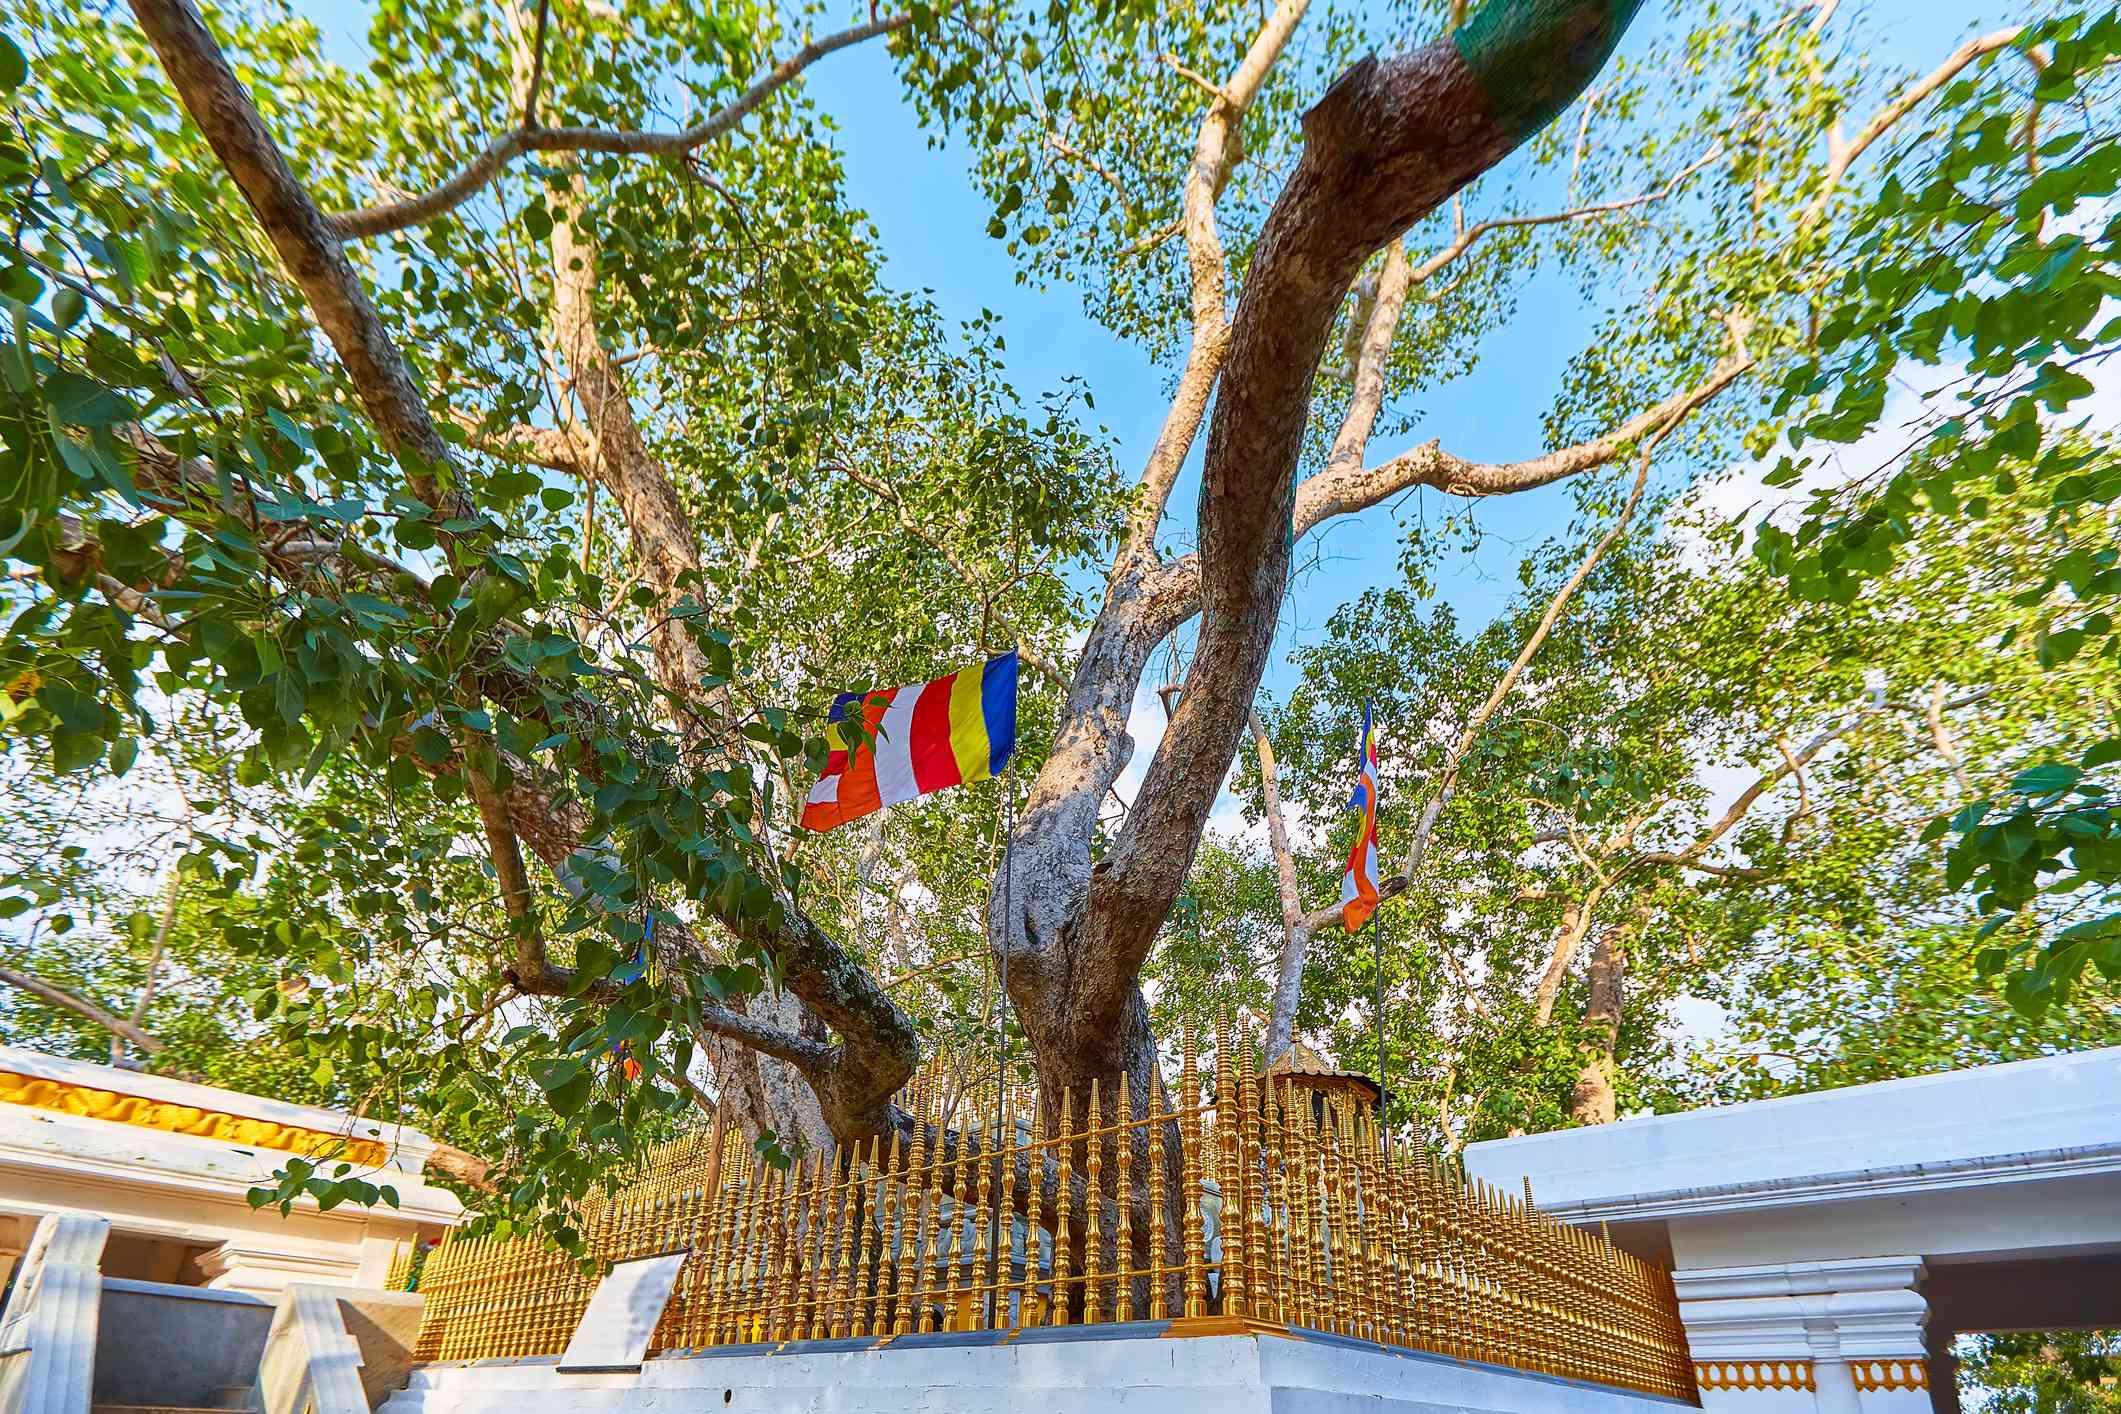 Jaya Sri Maha Bodhi sacred fig tree in the Mahamewna Gardens, Anuradhapura